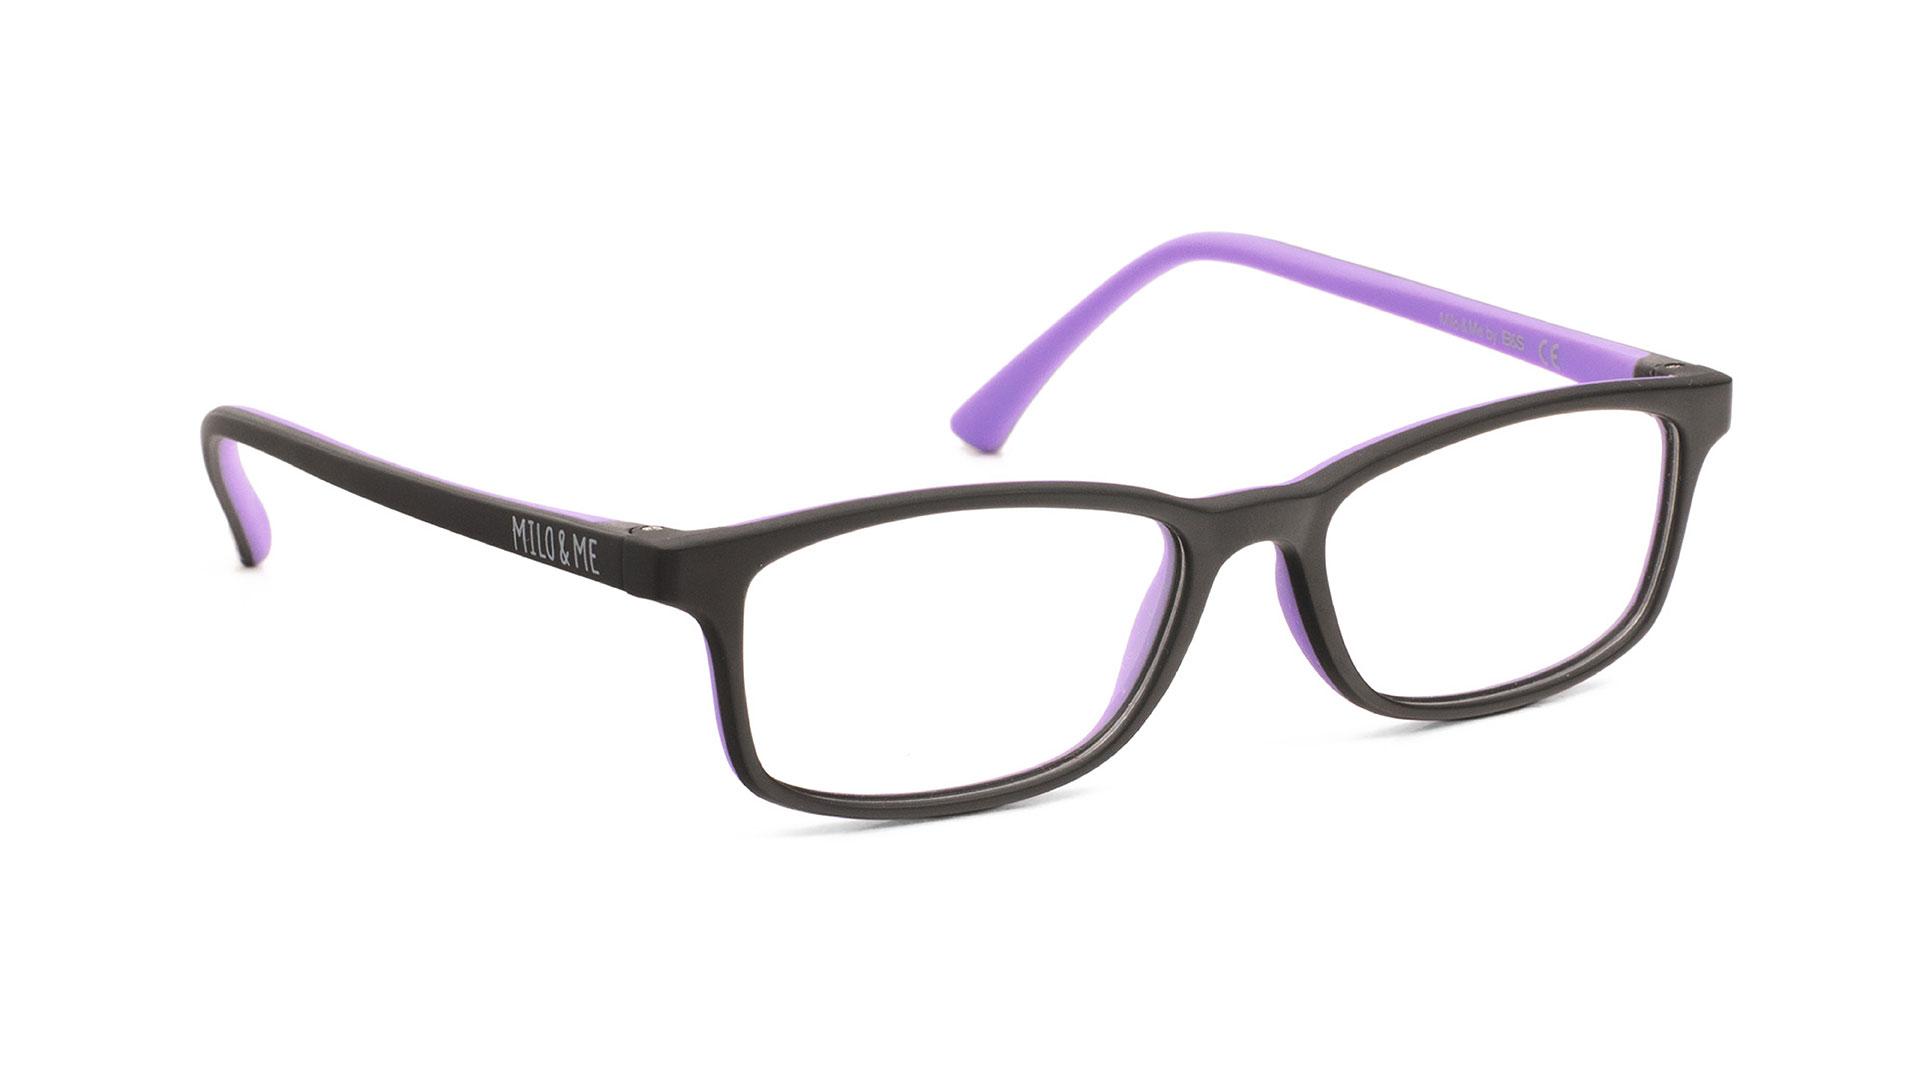 Black Light Lilac H85031-15 - Milo & Me Eyewear - Optimum RX Lens Specialists